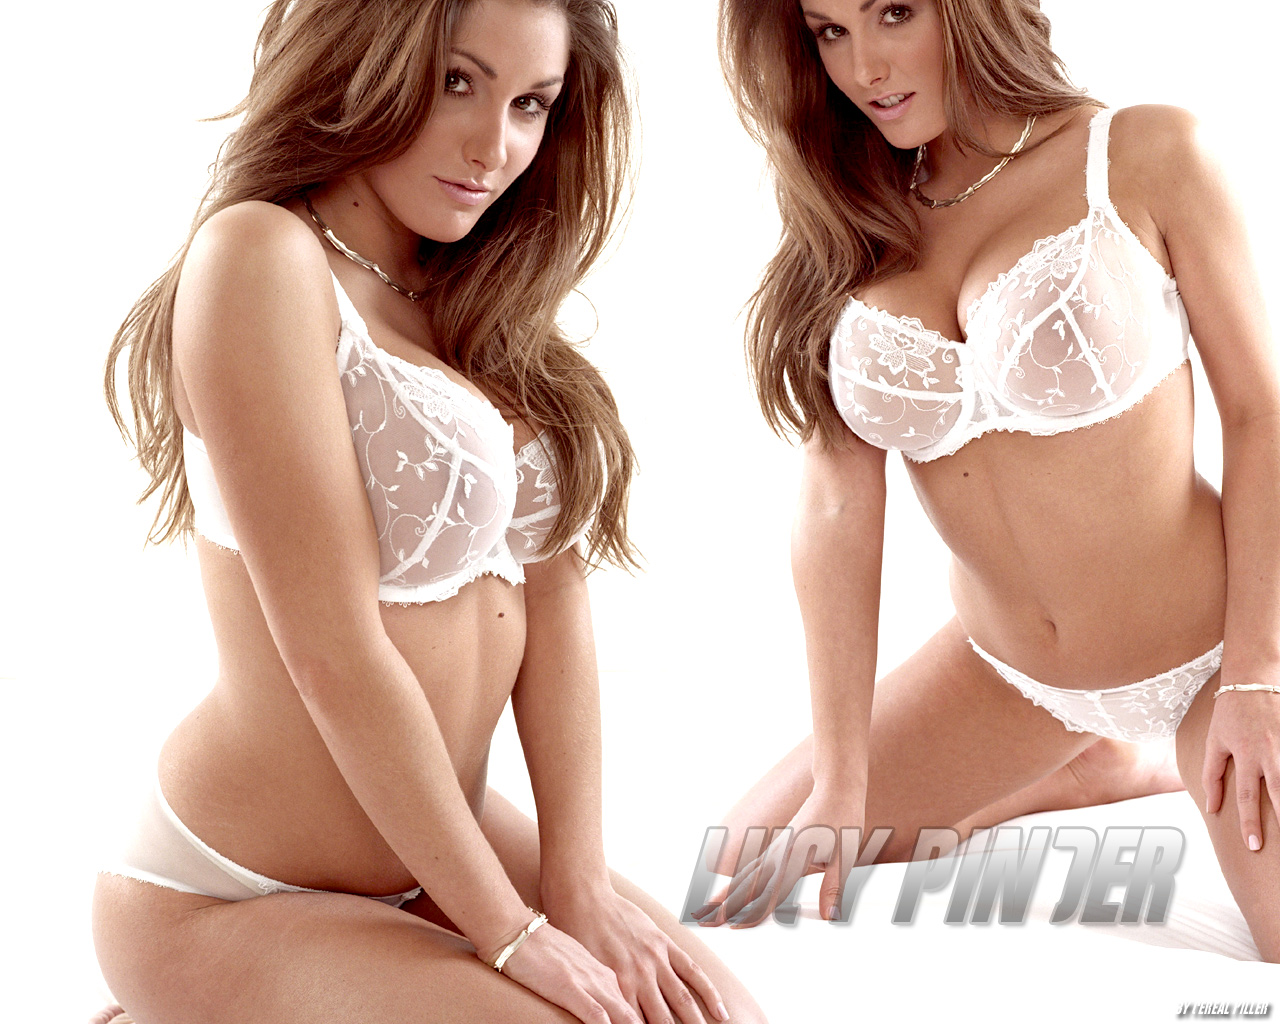 http://3.bp.blogspot.com/_veDbg4Zs4Sg/SuMiqTmoNOI/AAAAAAAABhw/eOpZ9NajNWg/s1600/sexy_celebs_bikini_wallpaper_7.jpg